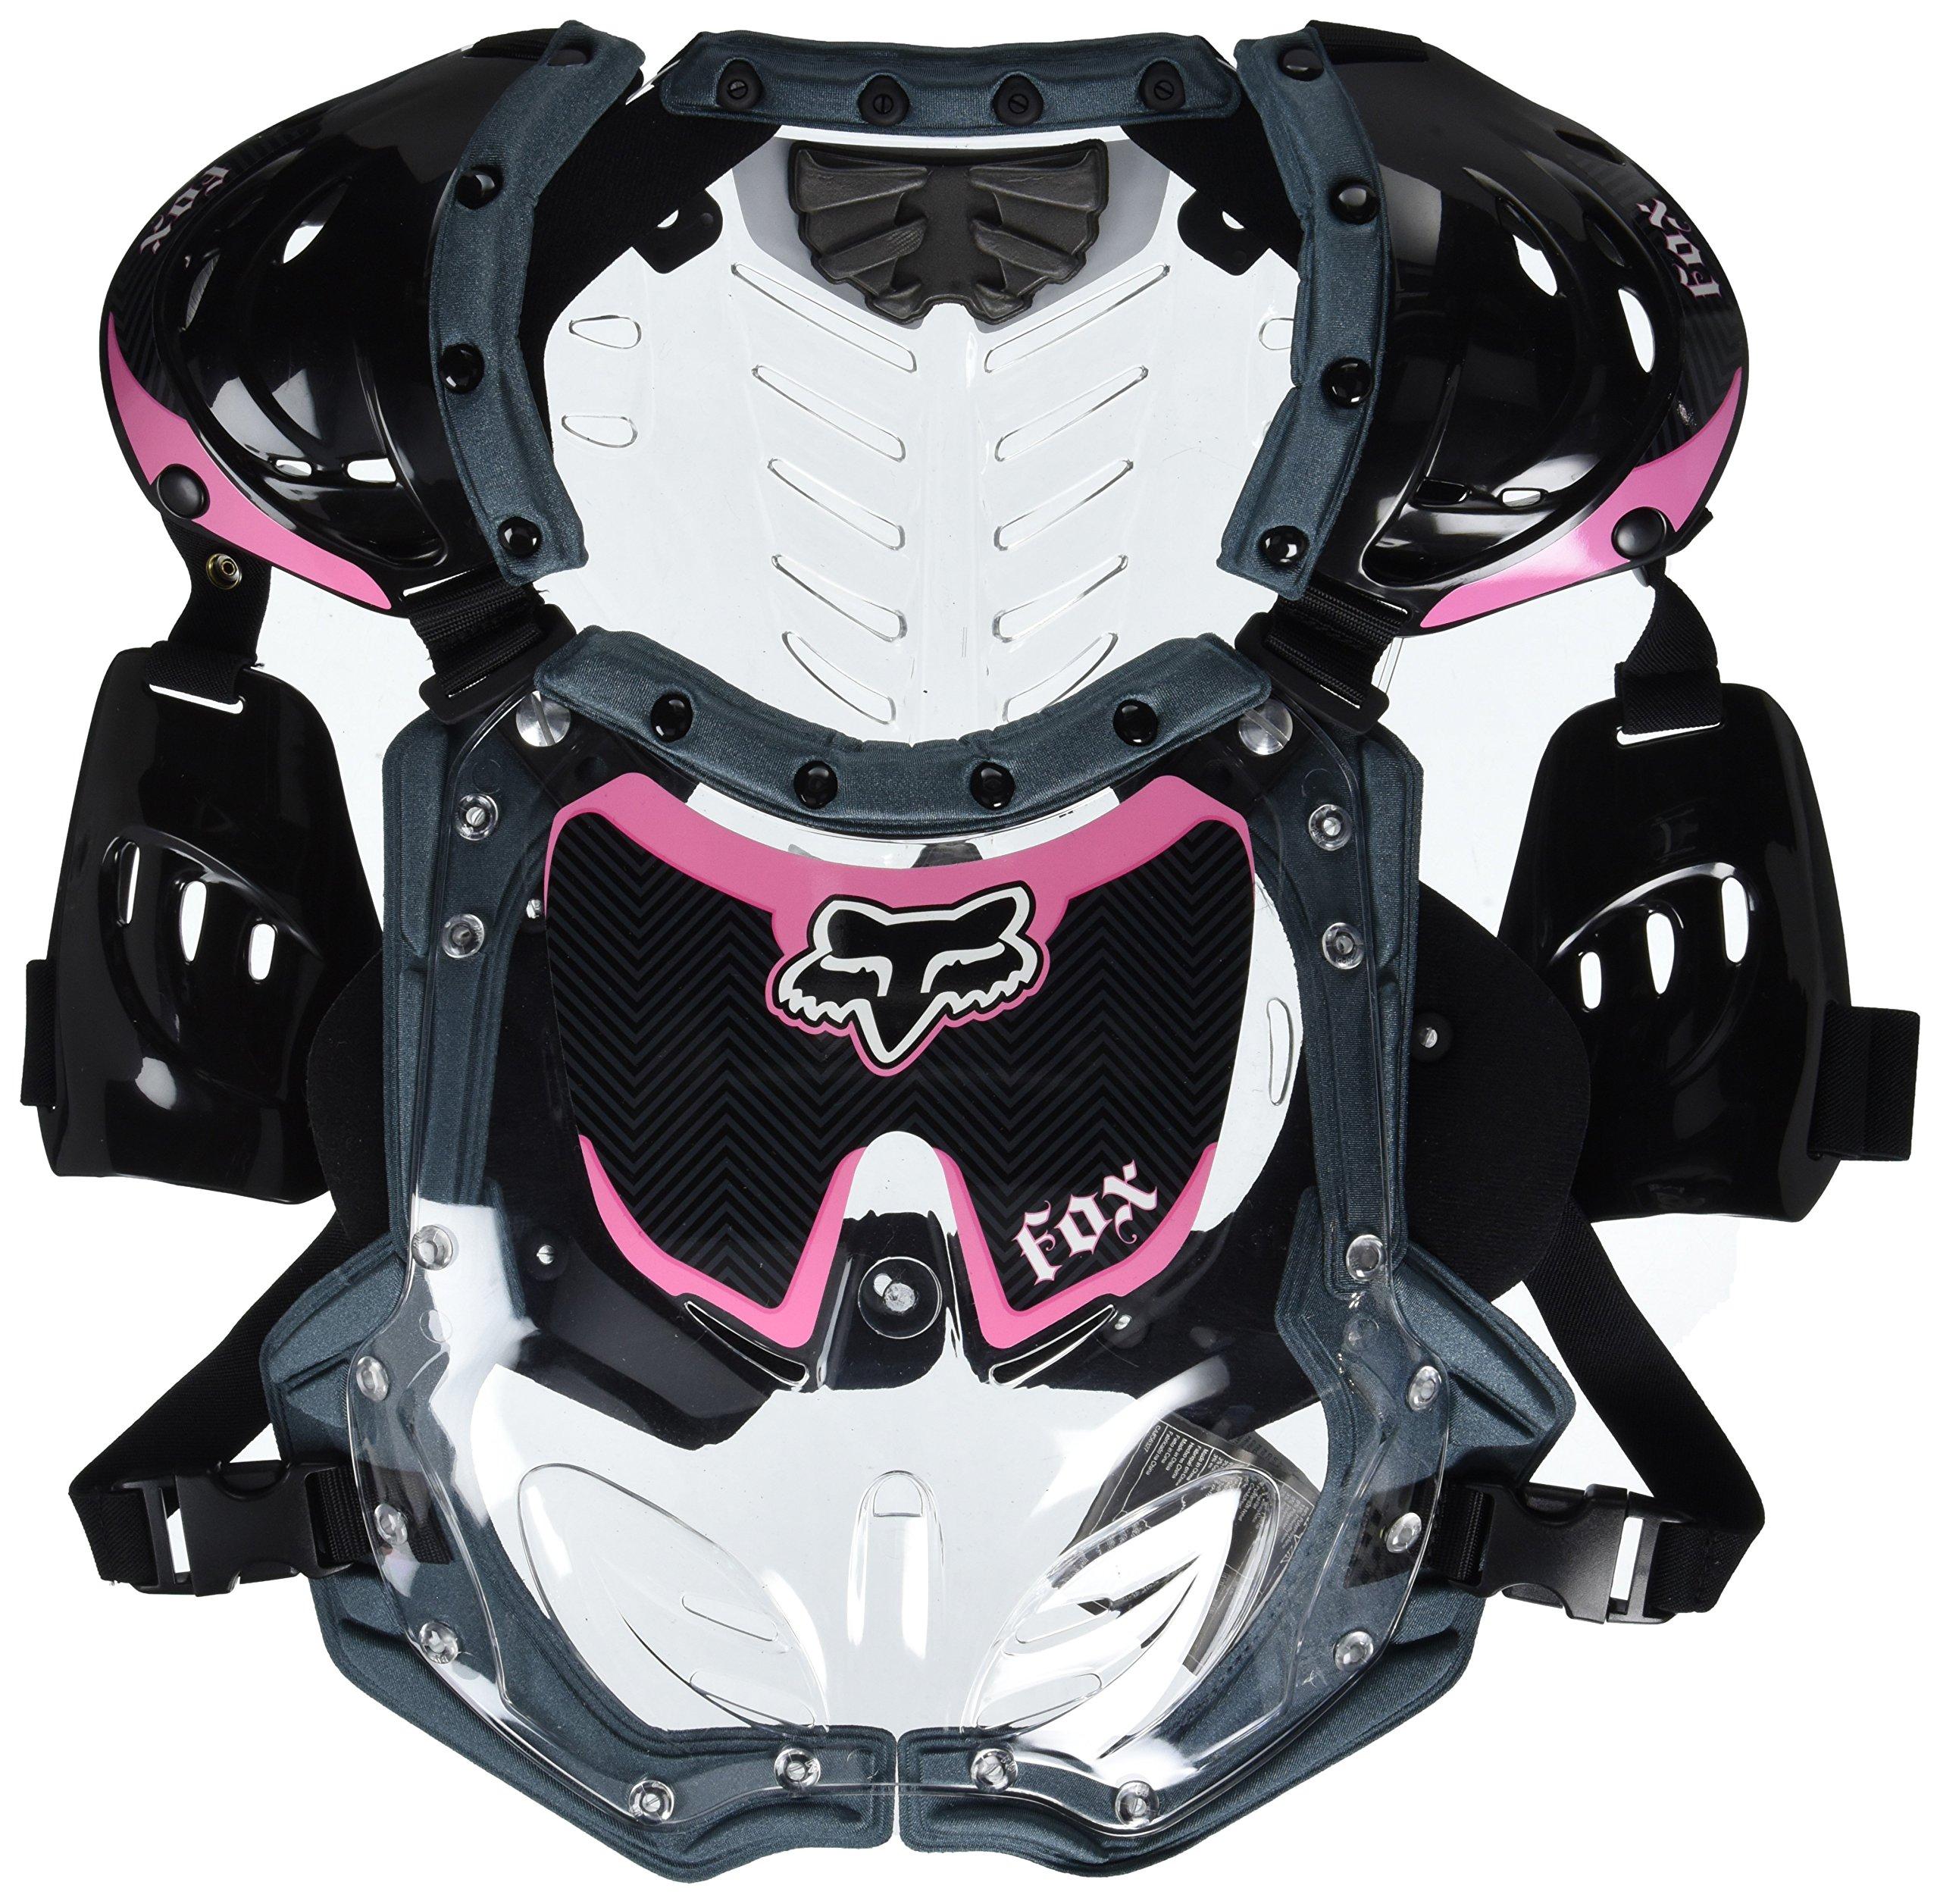 Fox Racing R3 Women's Roost Deflector MotoX Motorcycle Body Armor - Black/Pink / Small/Medium